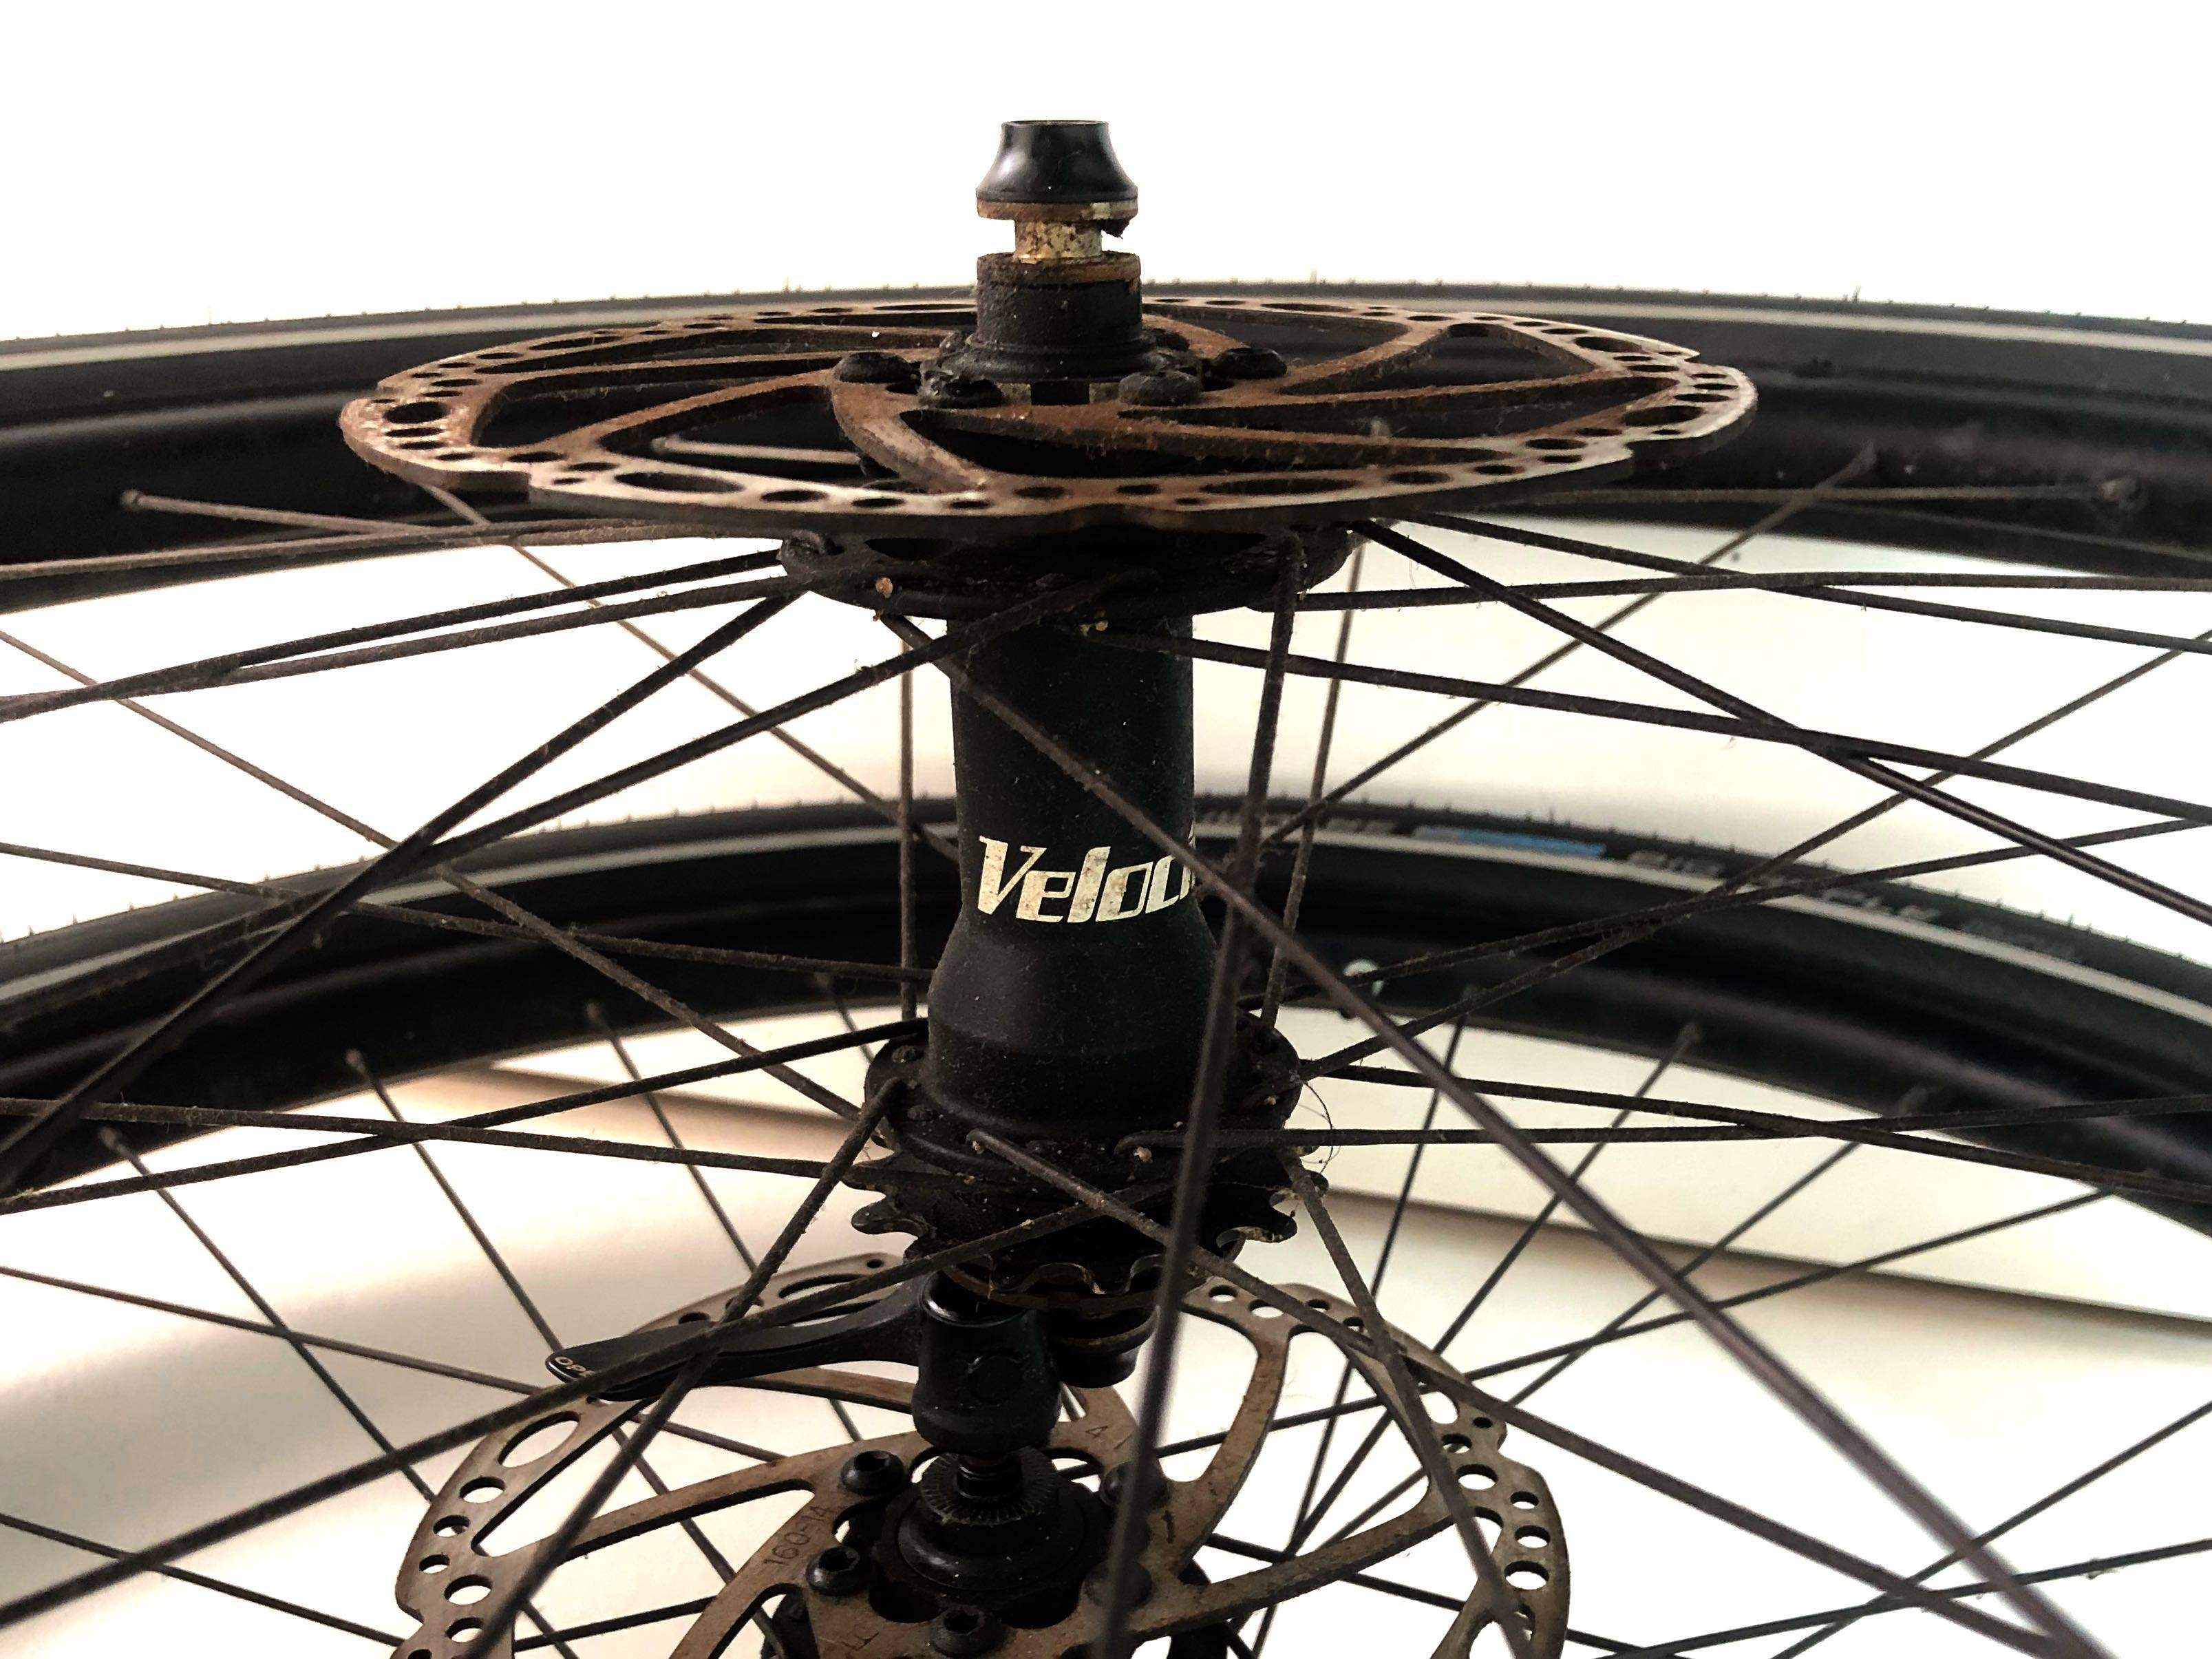 Surly Wheelset